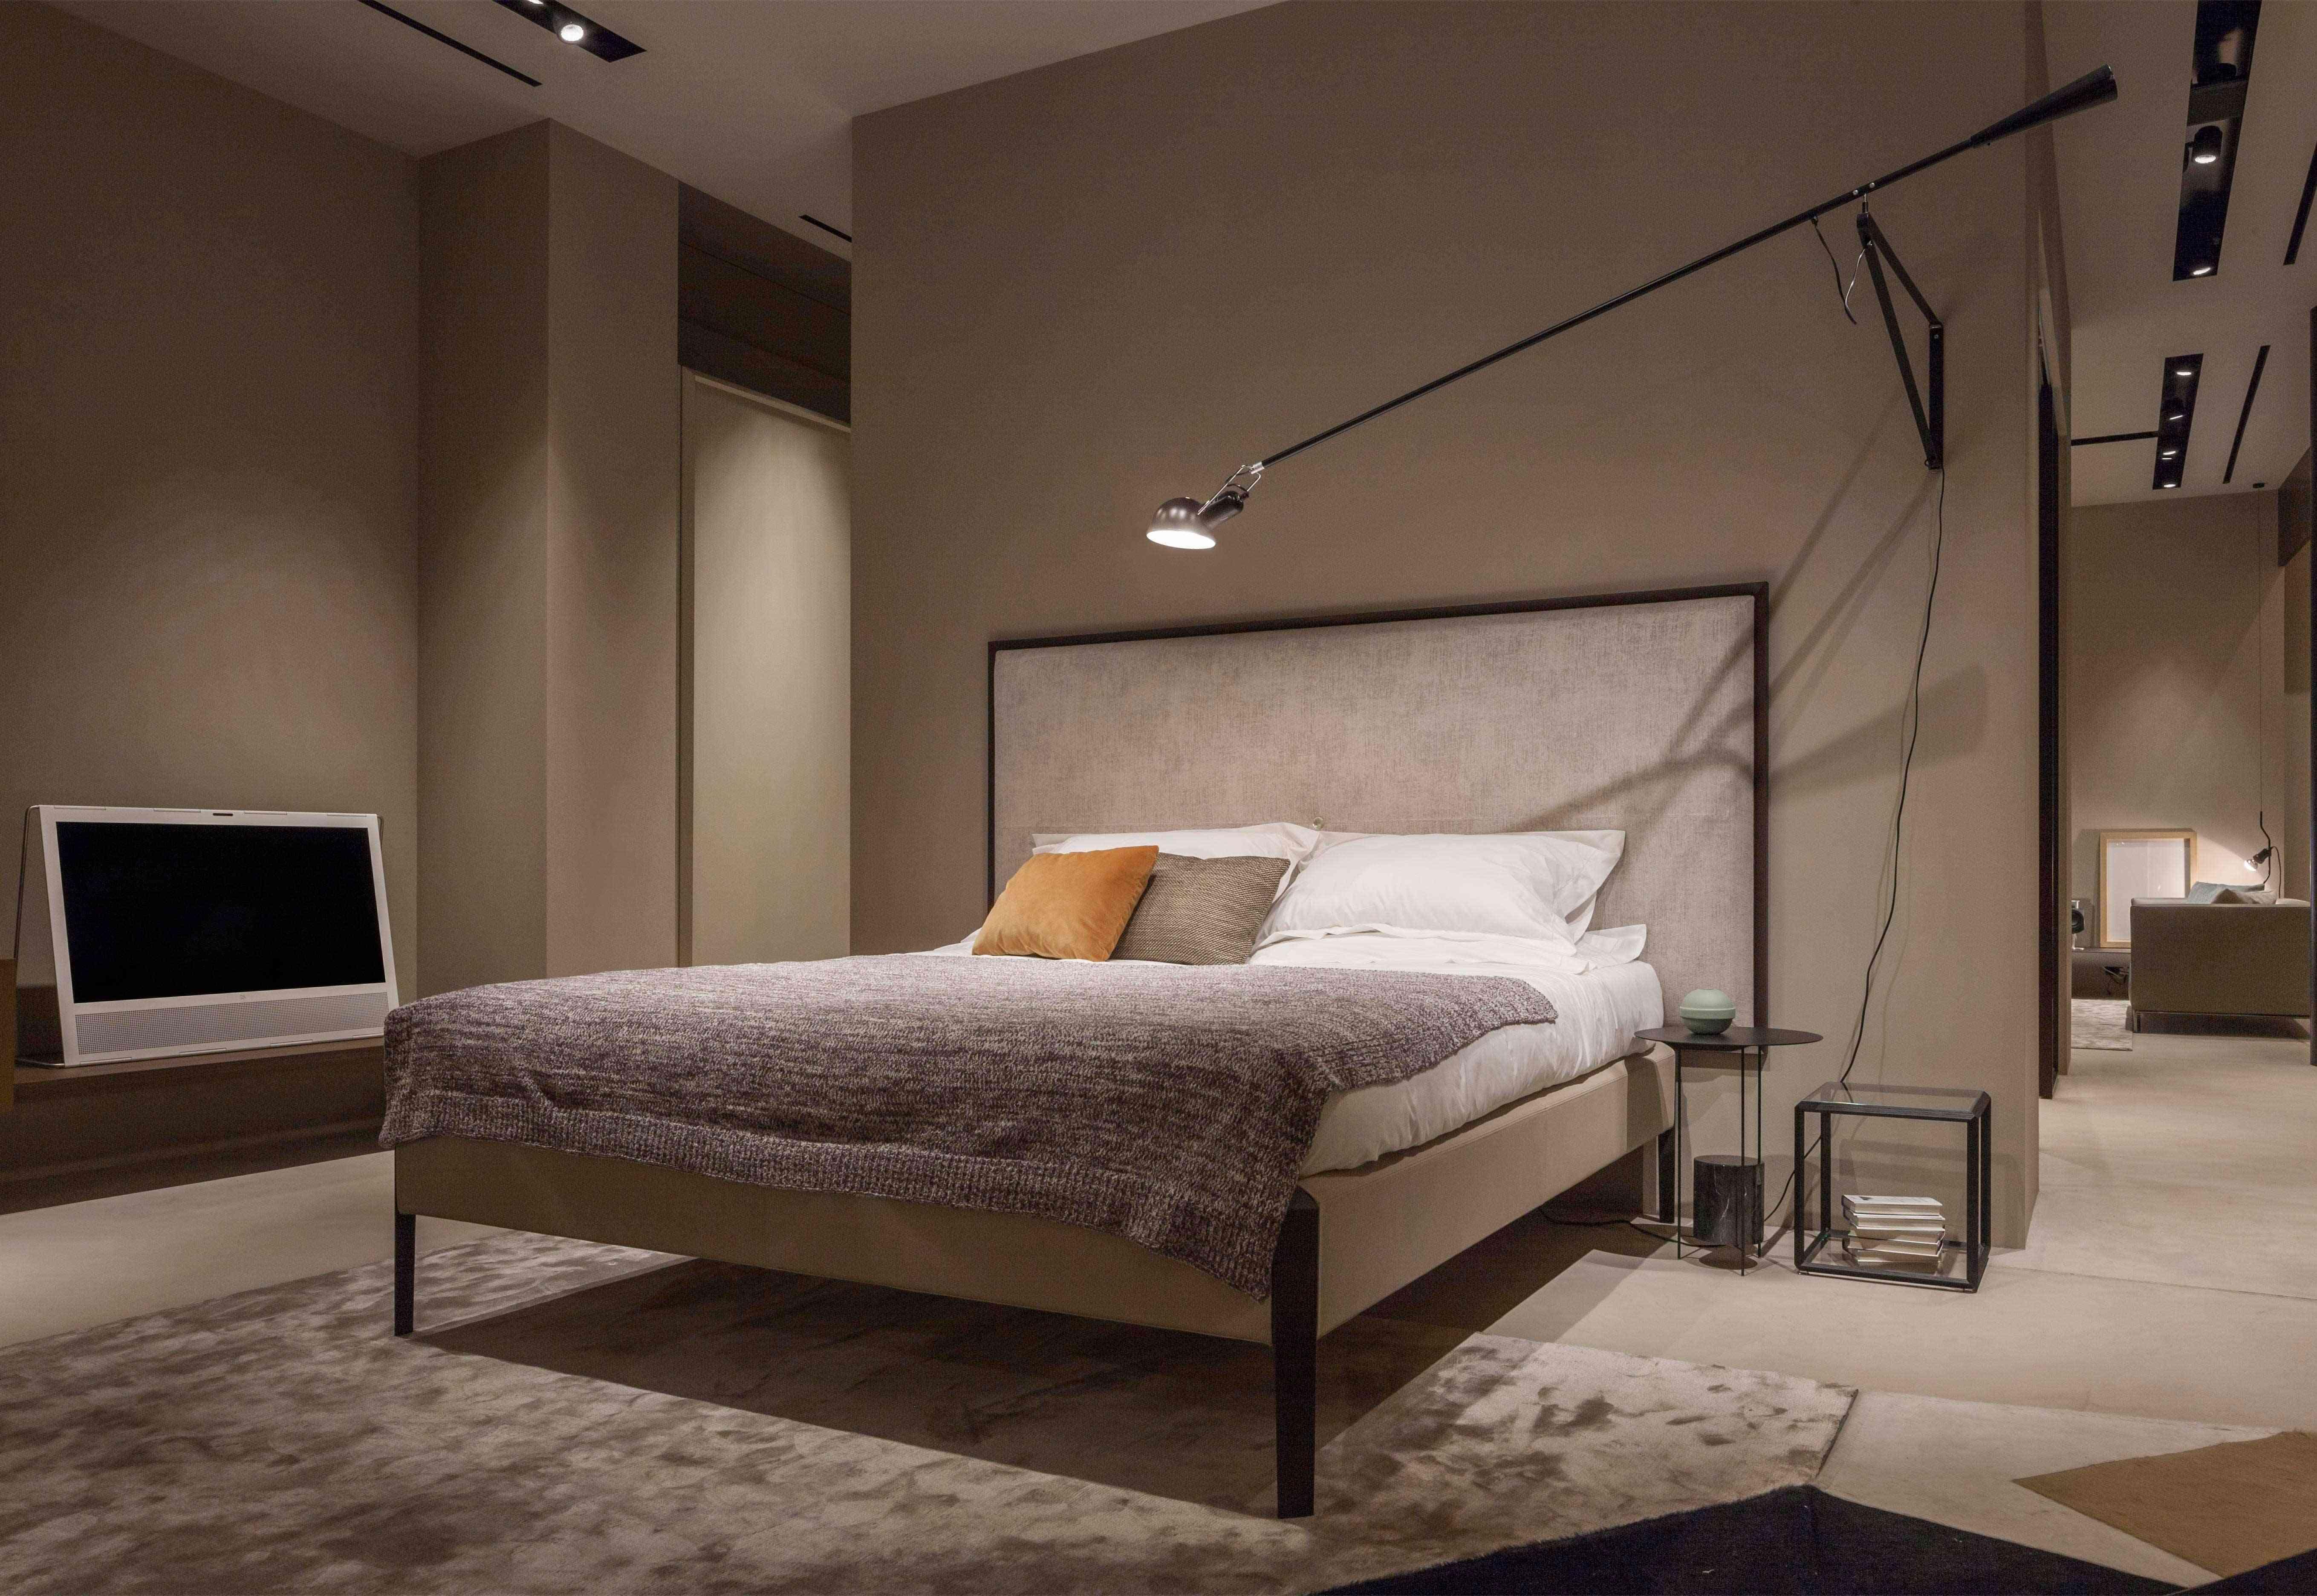 Mod 265 Bedroom Wall Lamp